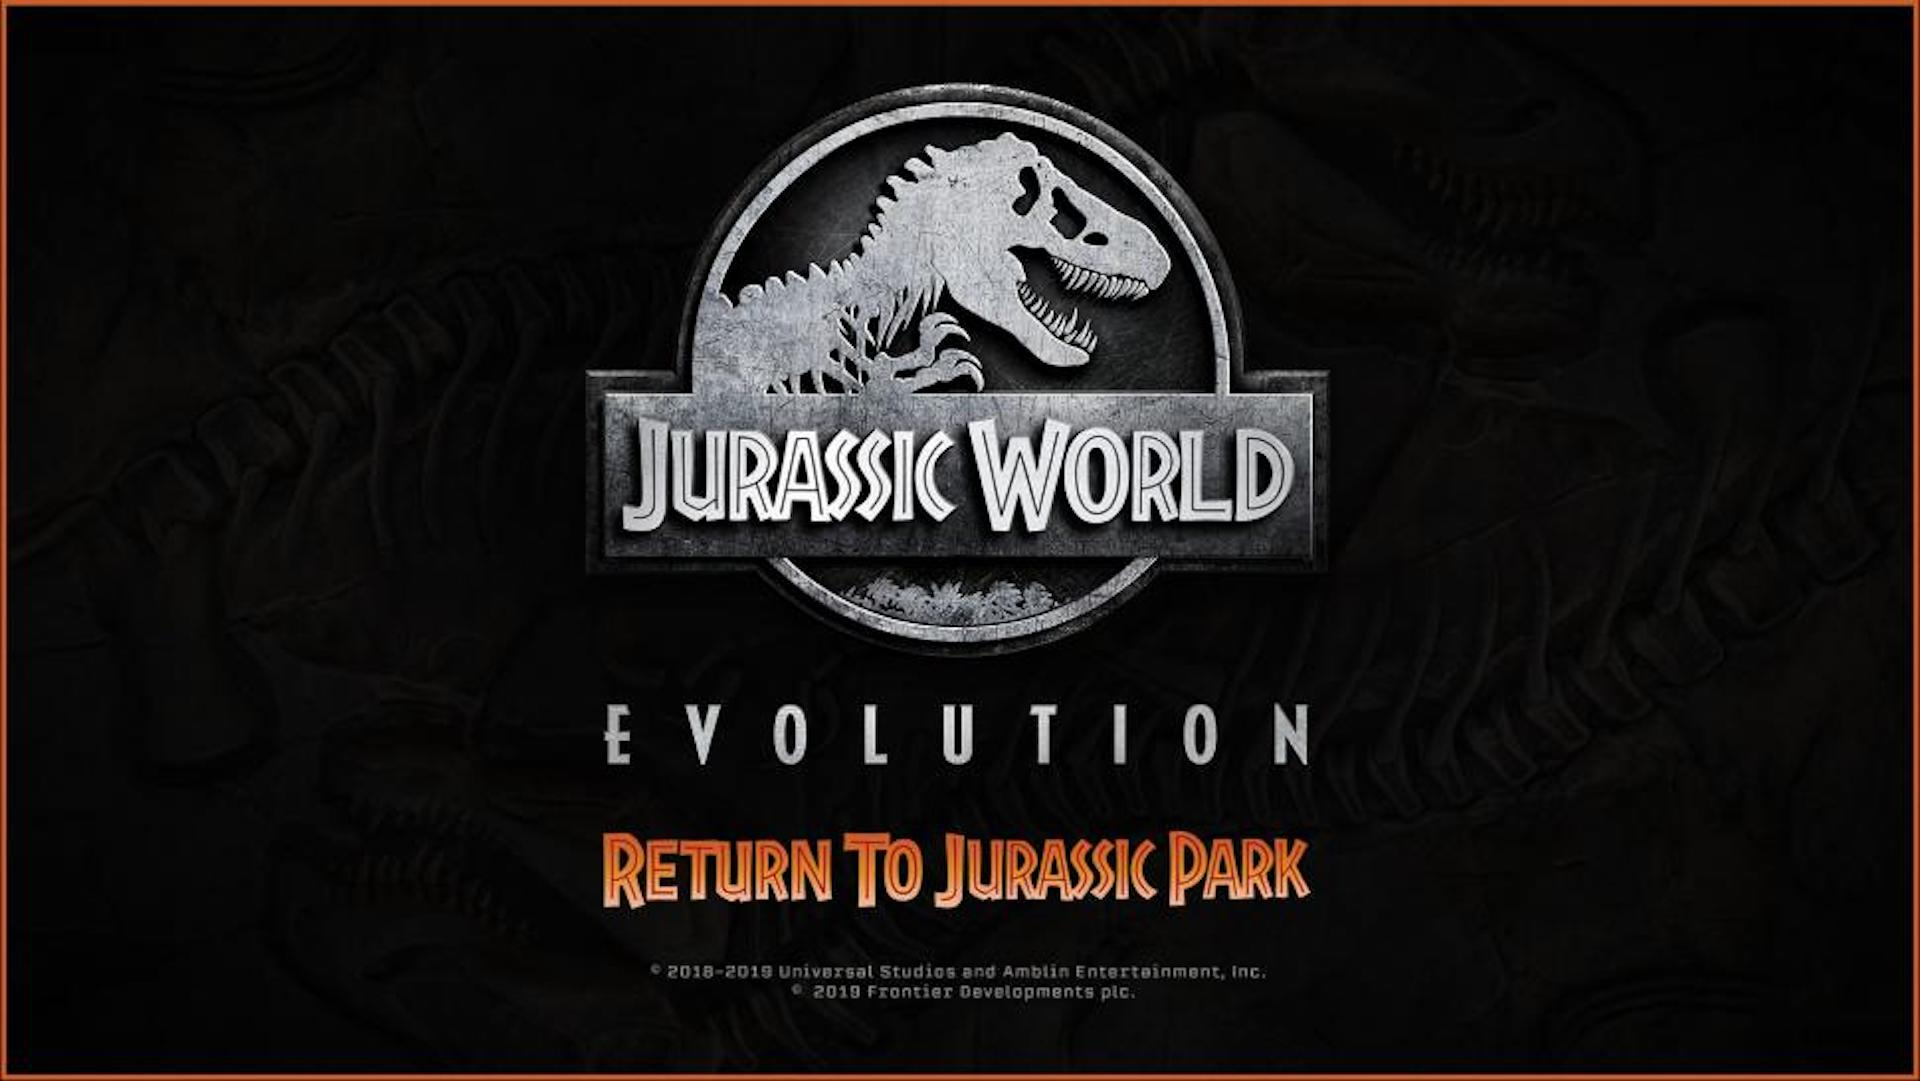 jurassic world evolution return to jurassic park dlc